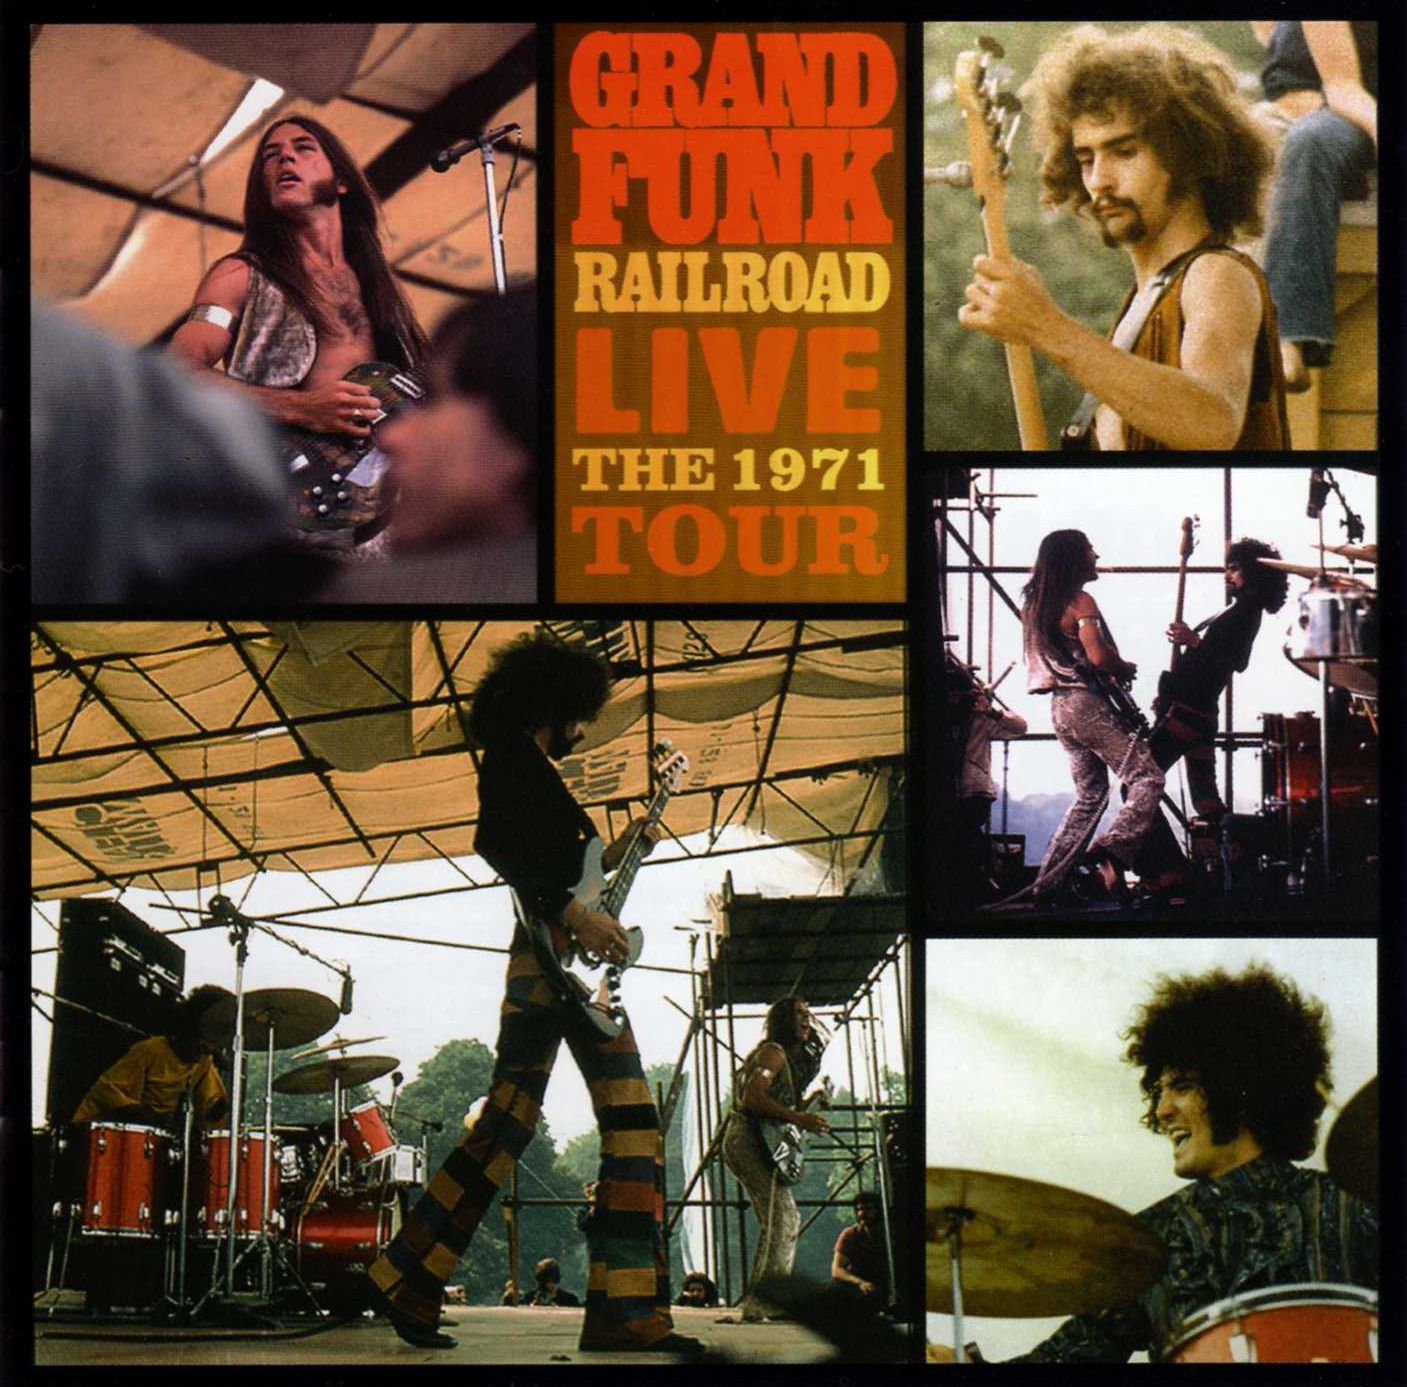 Grand Funk Railroad Tour : grand funk railroad live the 1971 tour 2002 flac ~ Russianpoet.info Haus und Dekorationen